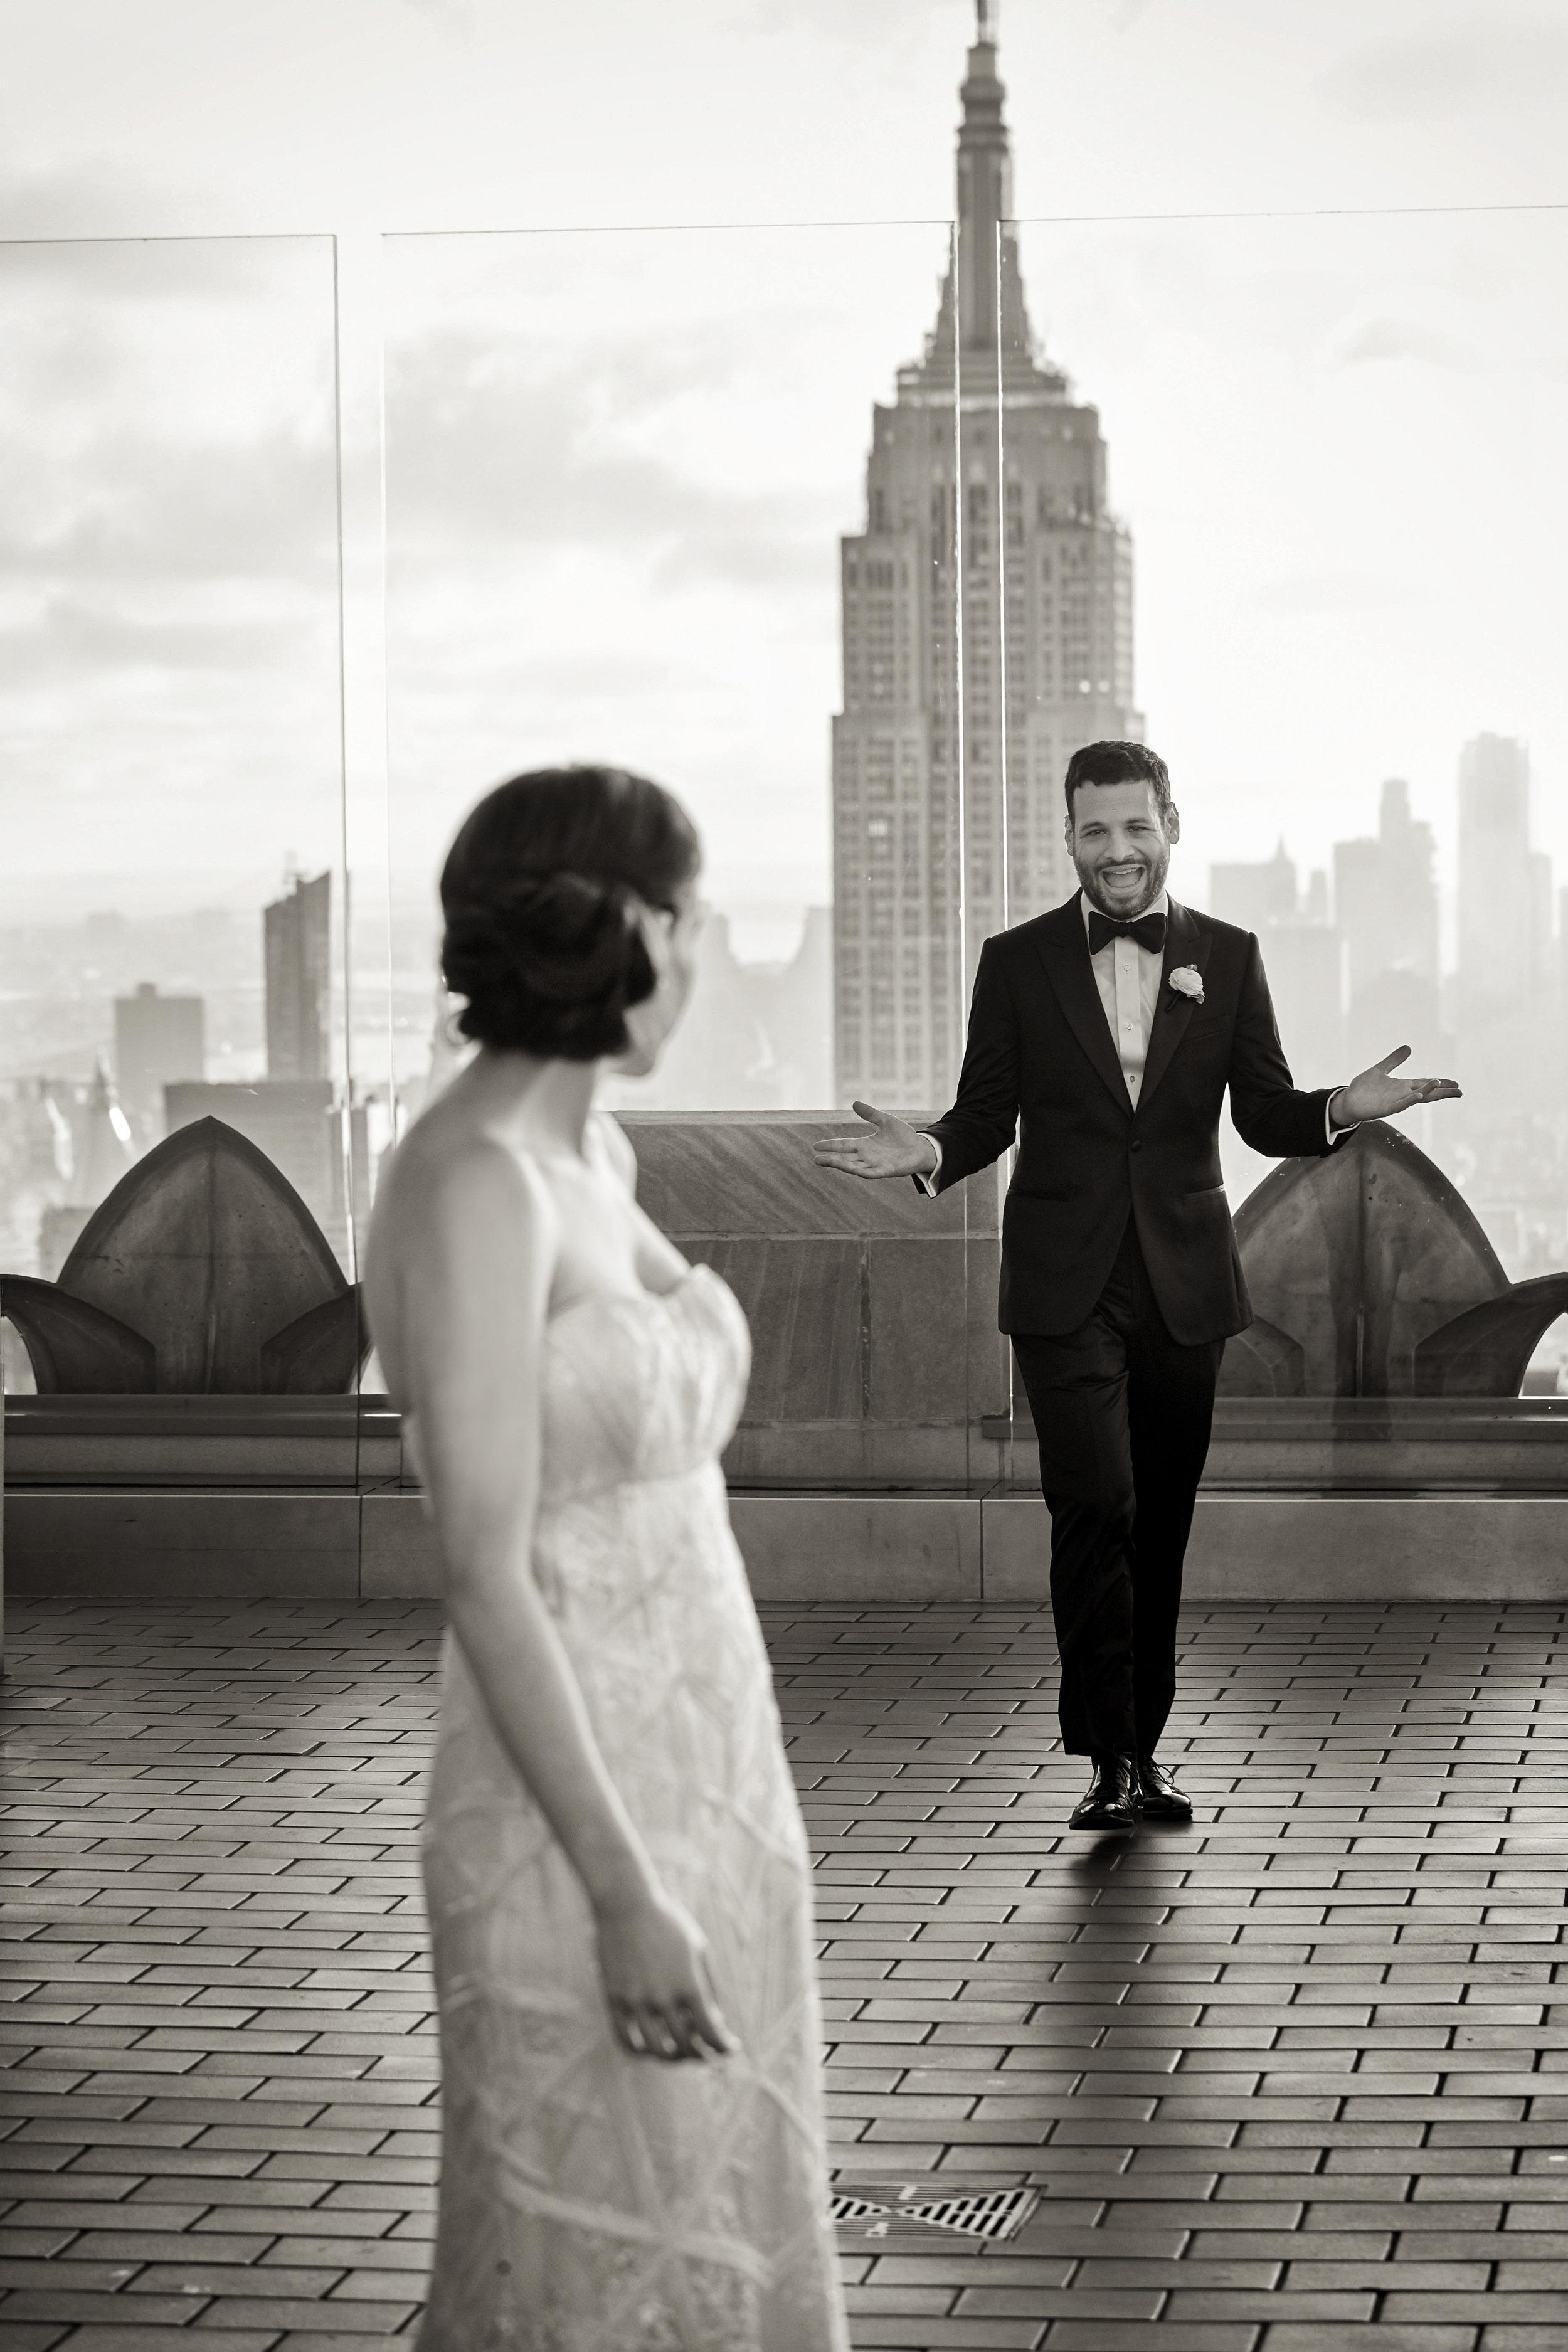 Rainbow Room Portrait by Shawn Connell Weddings